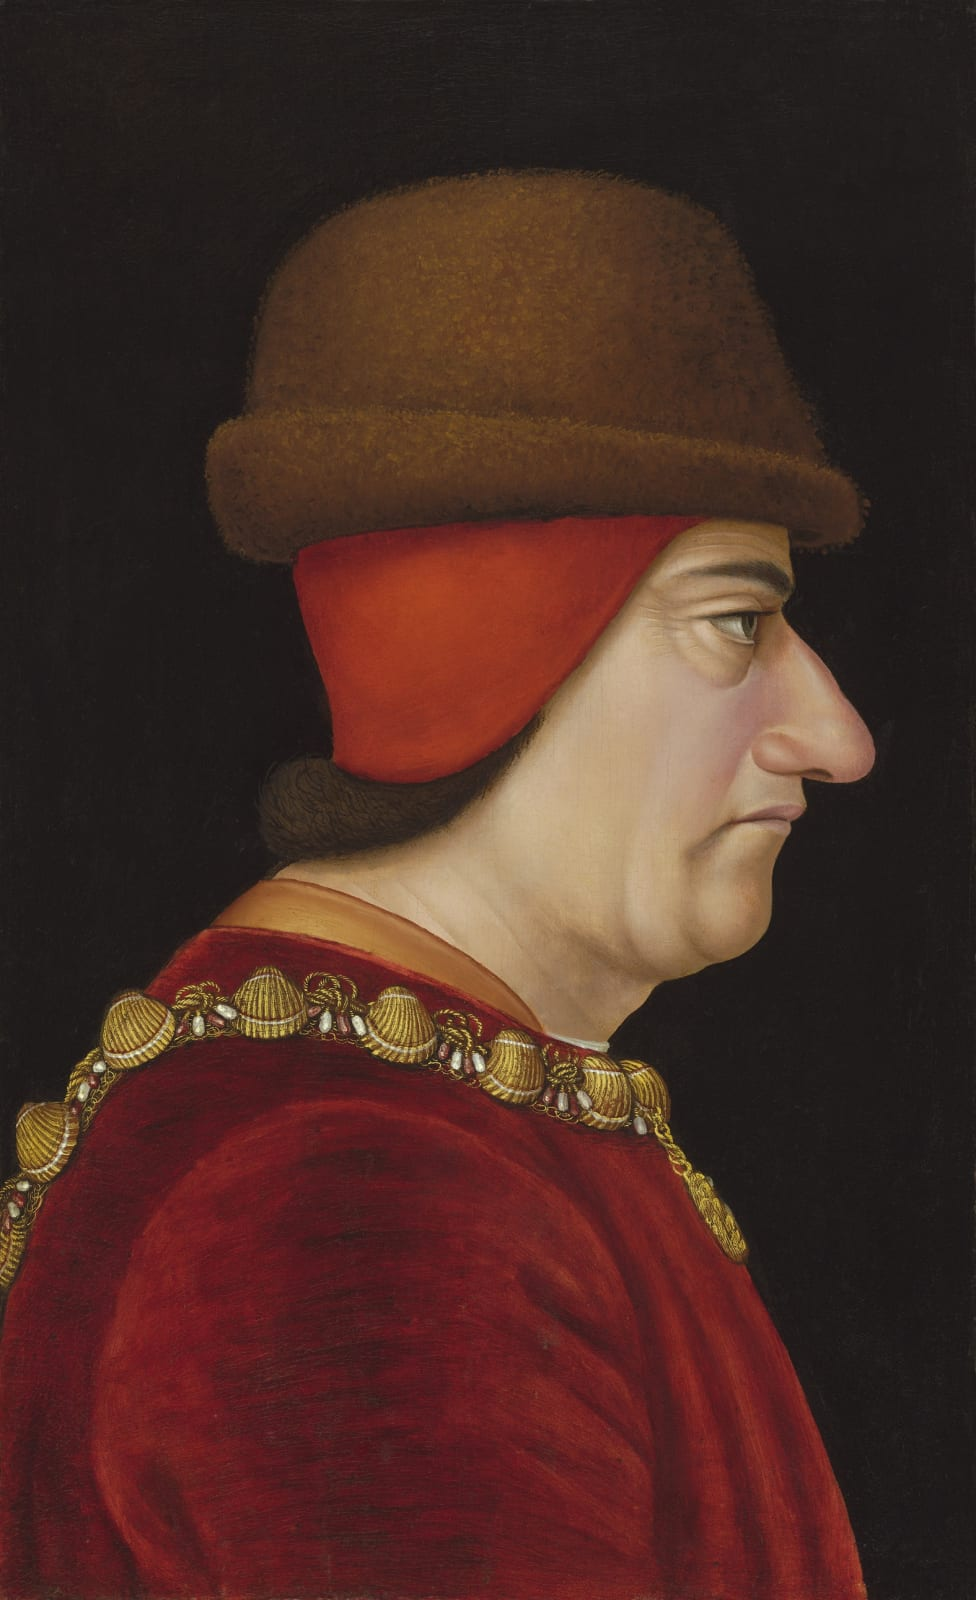 Louis XI, King of France (1423 – 1483)